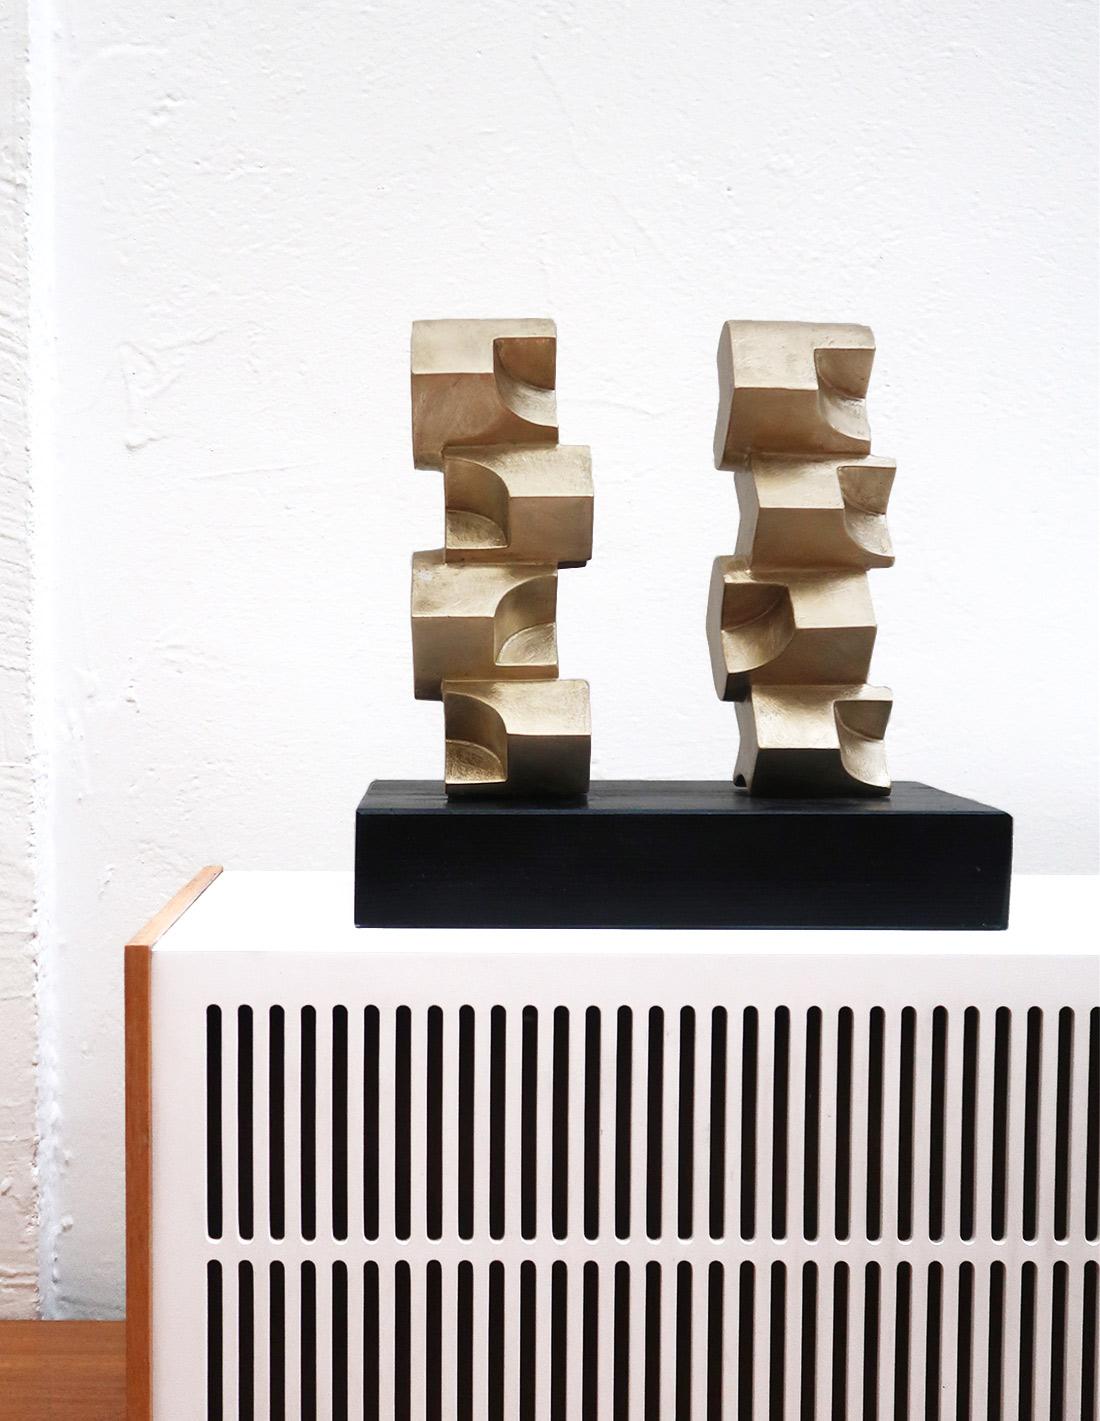 Lucia Volentieri - Sculpture - Due moduli